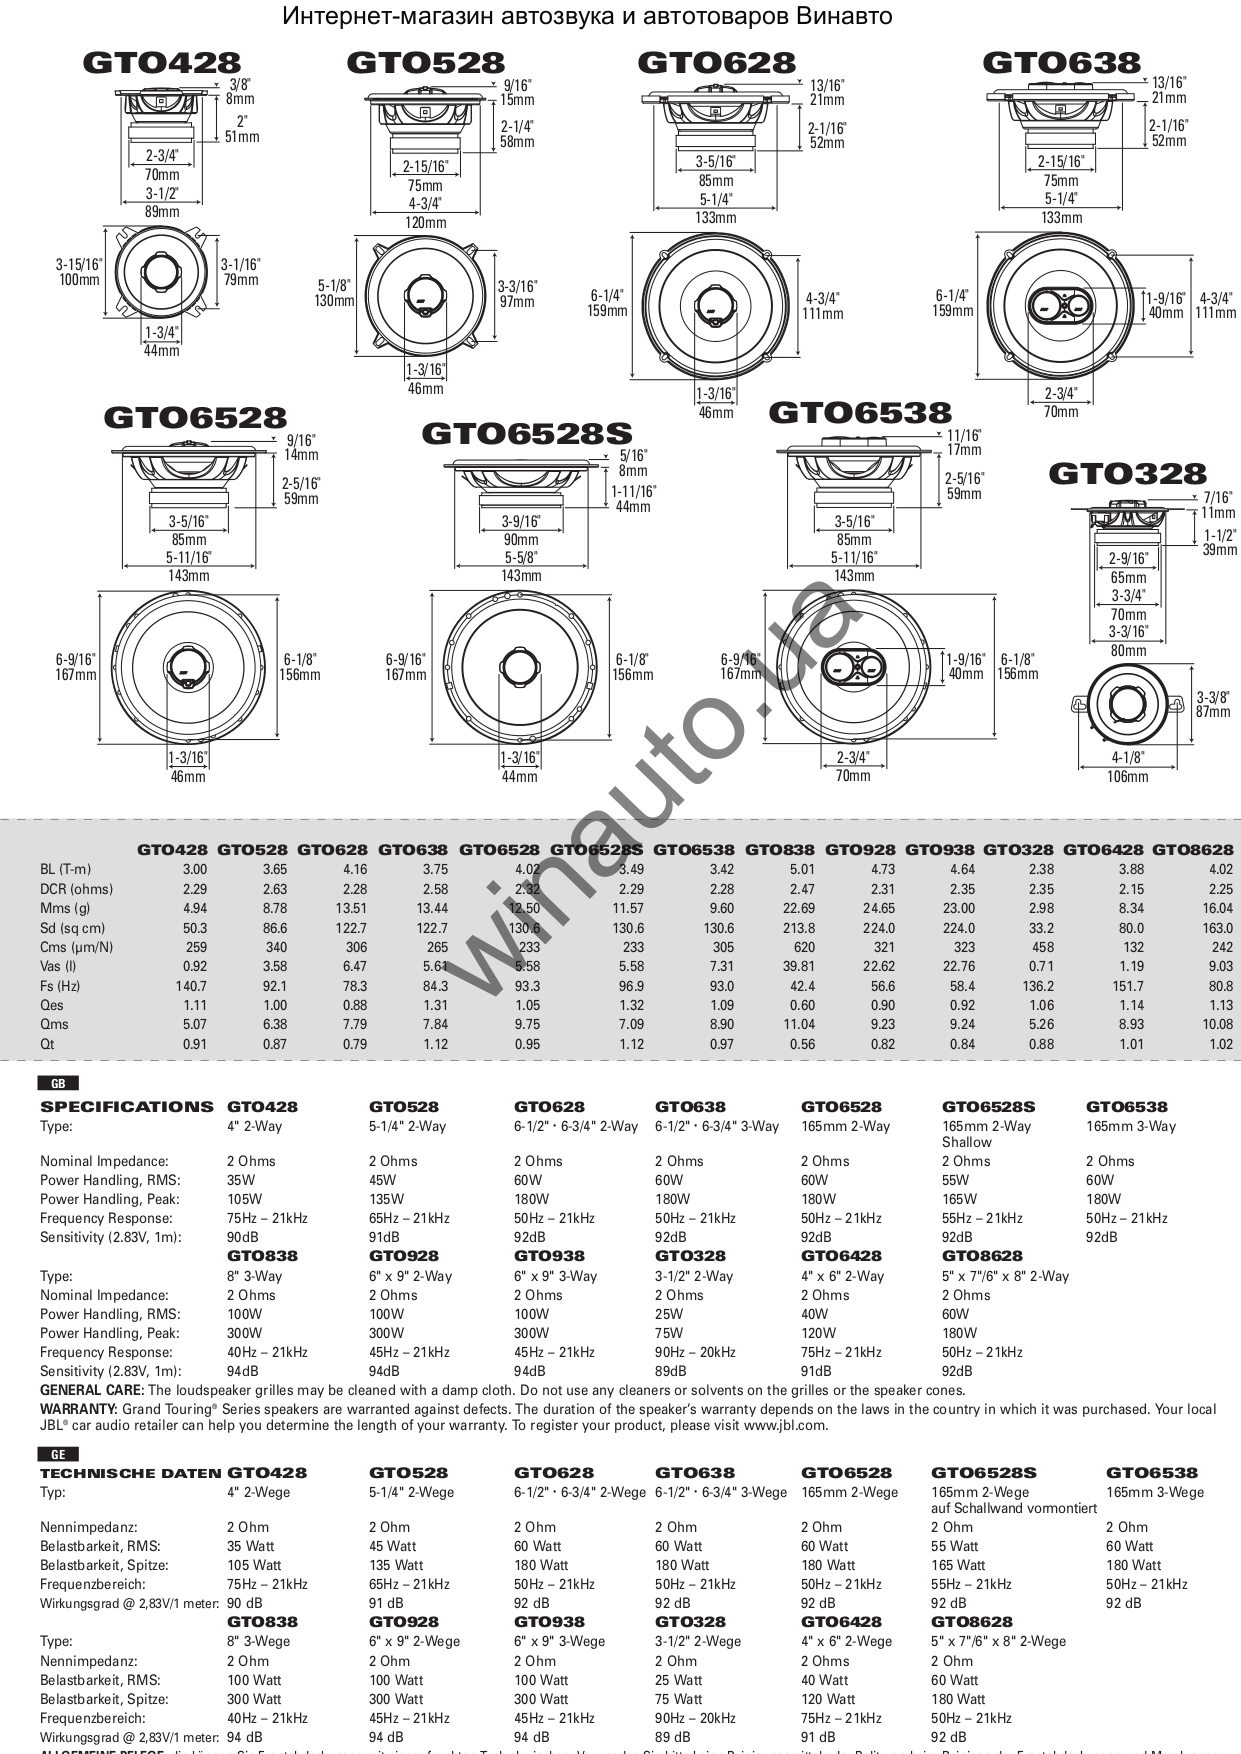 PDF manual for JBL Speaker Grand Touring Series GTO938